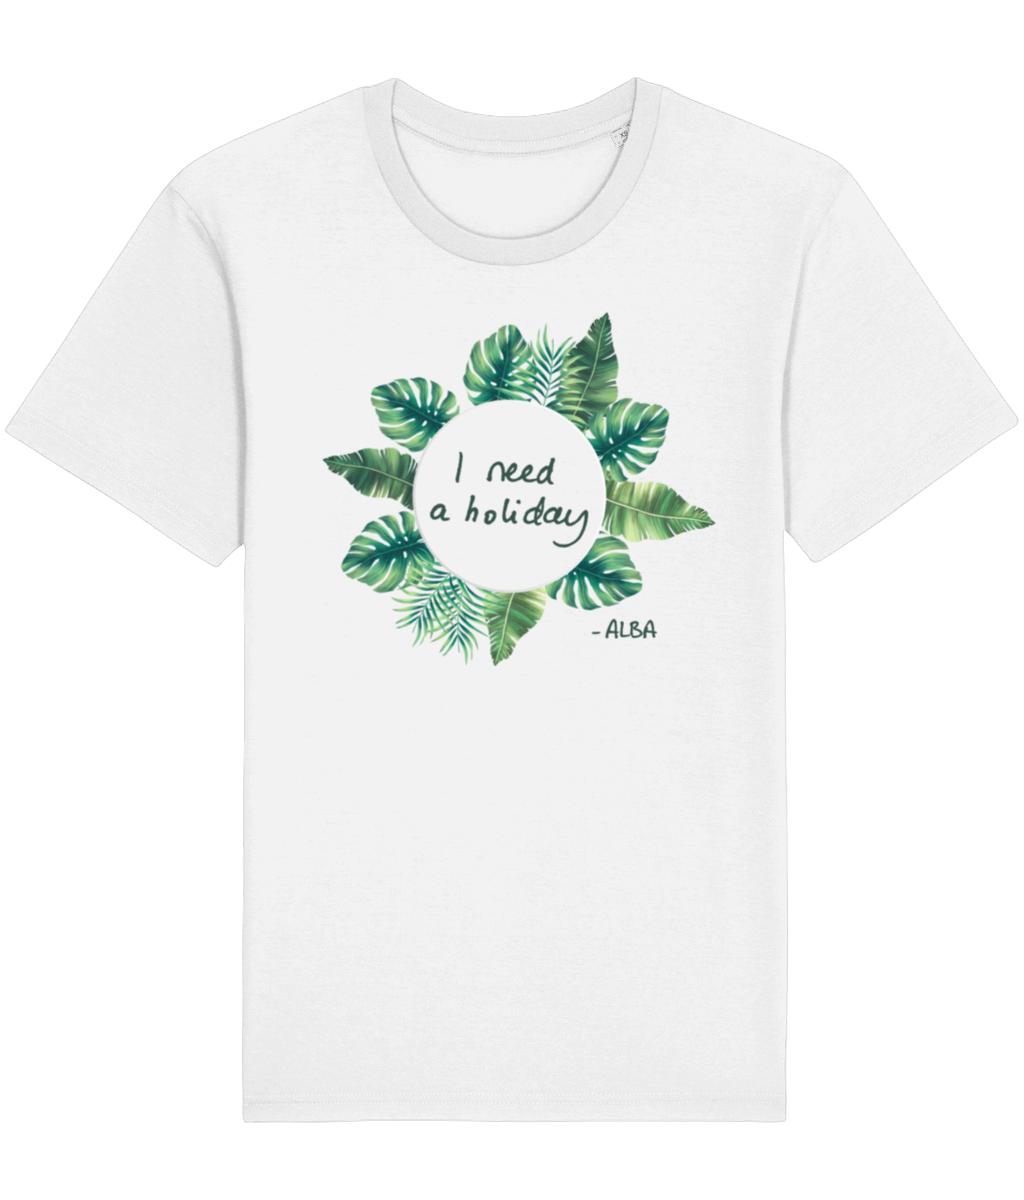 Straight-cut white t-shirt - I Need a Holiday